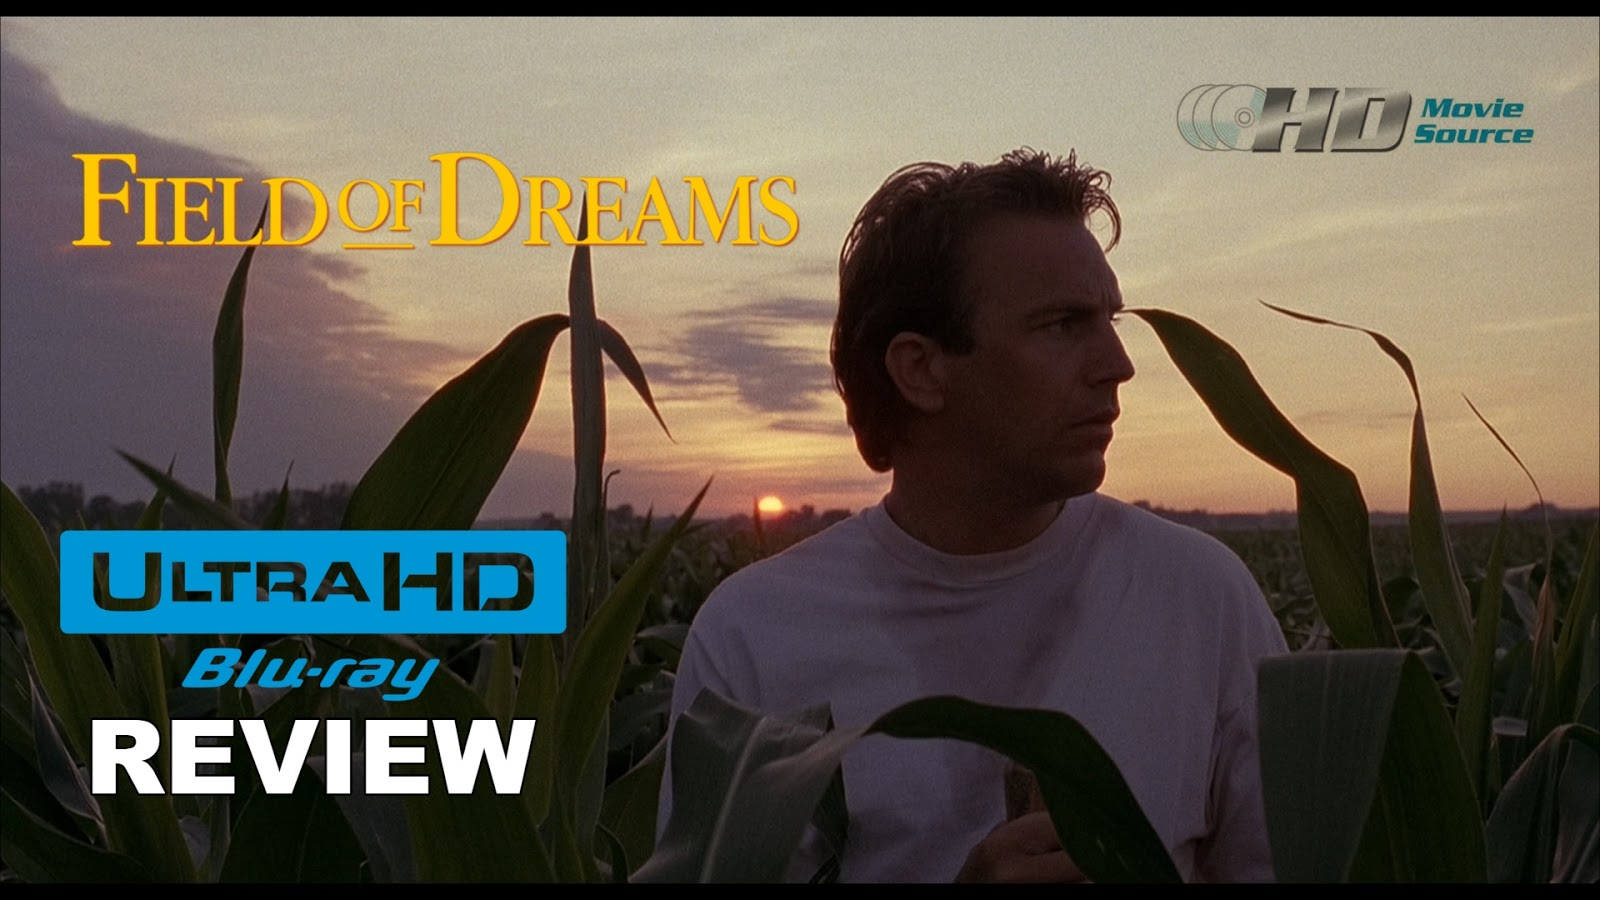 Field of Dreams (1989) 4K Ultra HD Blu-ray Blu-ray Review